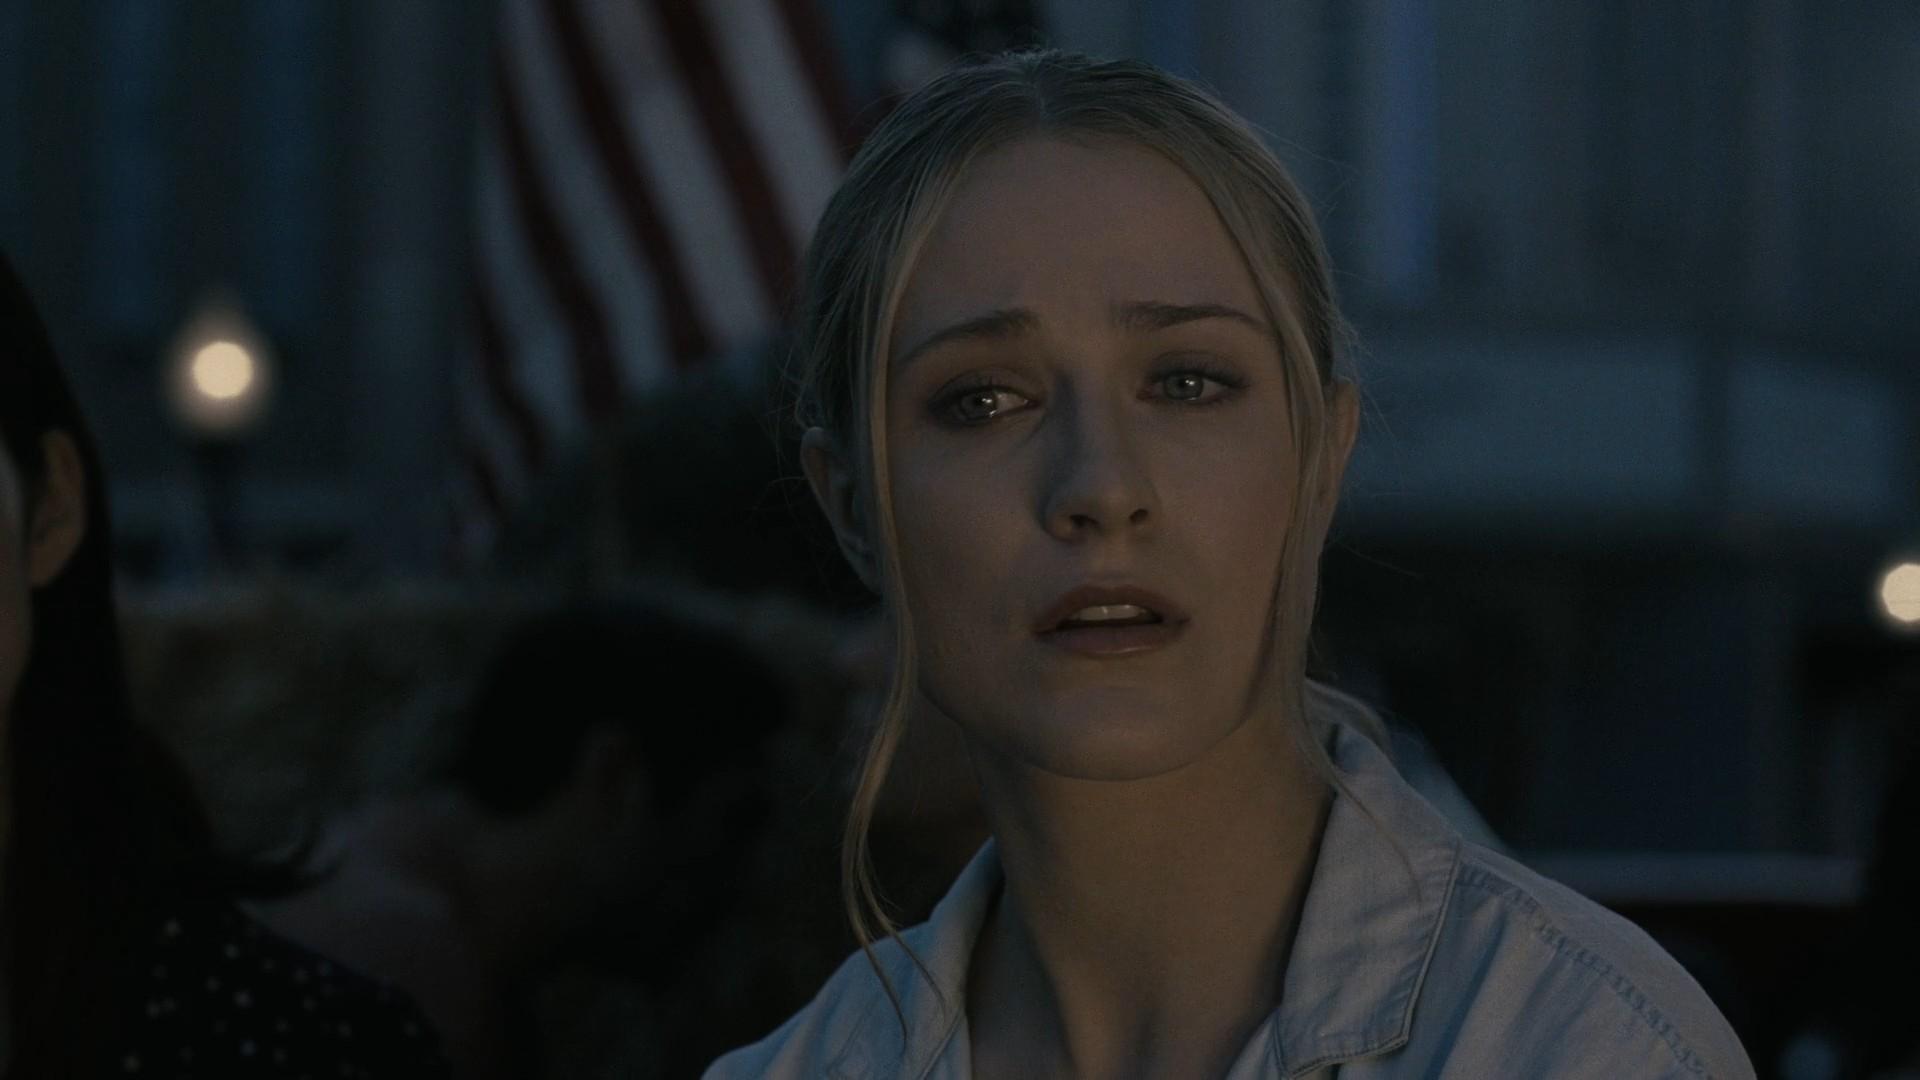 Westworld S03E08 Crisis Theory - Dolores